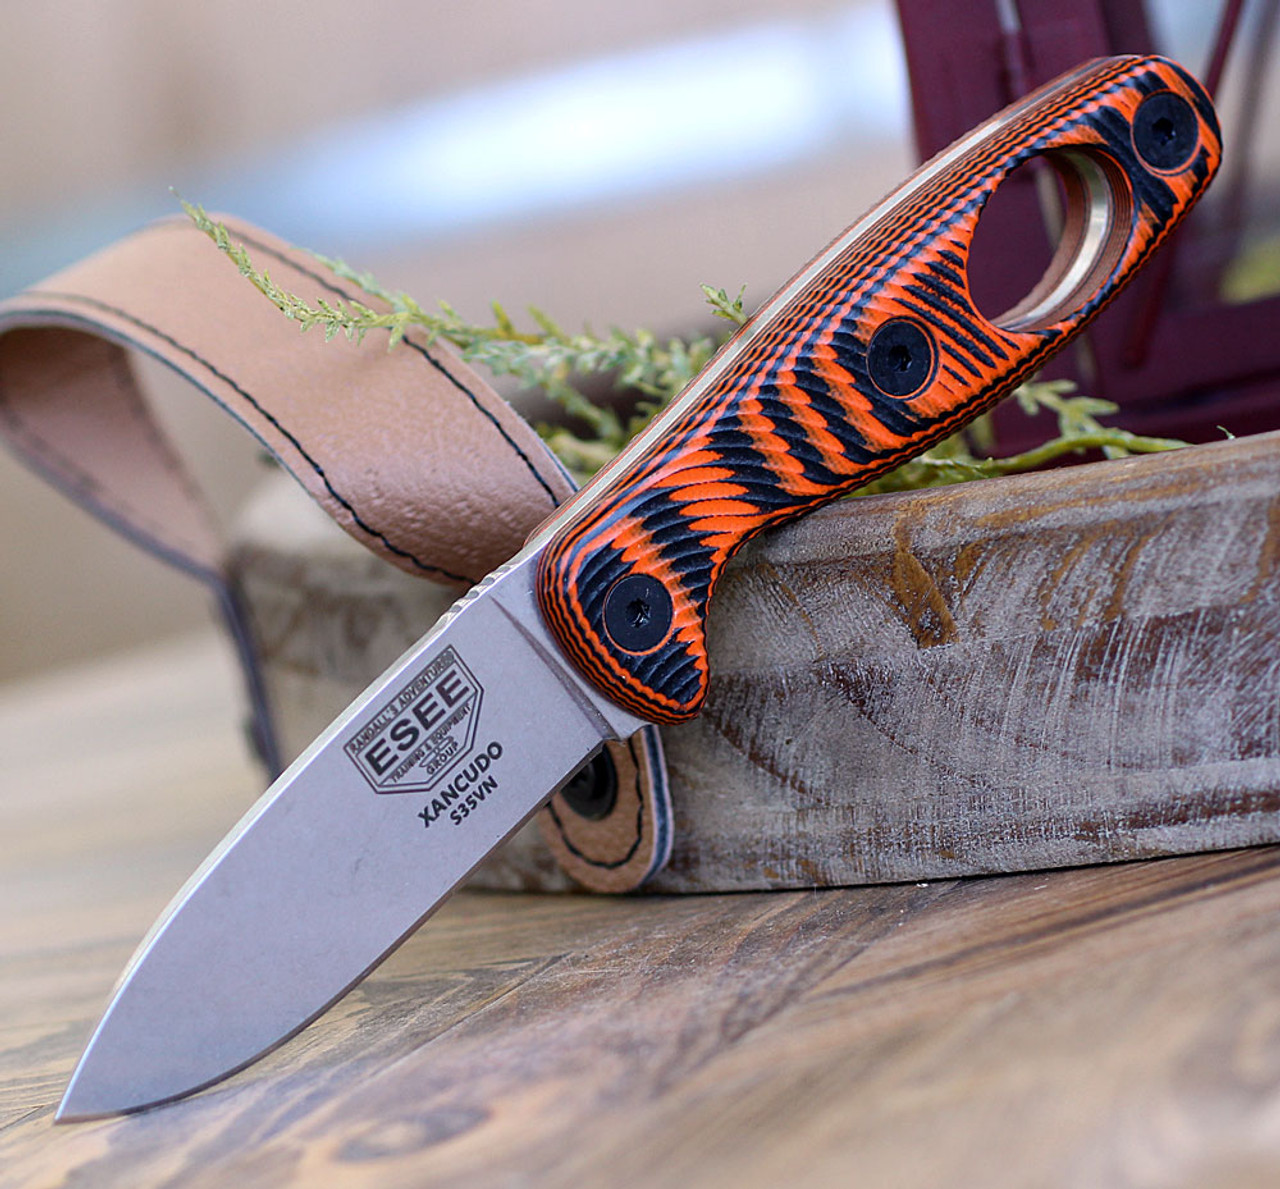 "ESEE Xancudo XAN1-006, 3.0"" S35VN Stonewash Plain Blade, Orange/Black G10 3D Handle w/hole, Black Sheath"